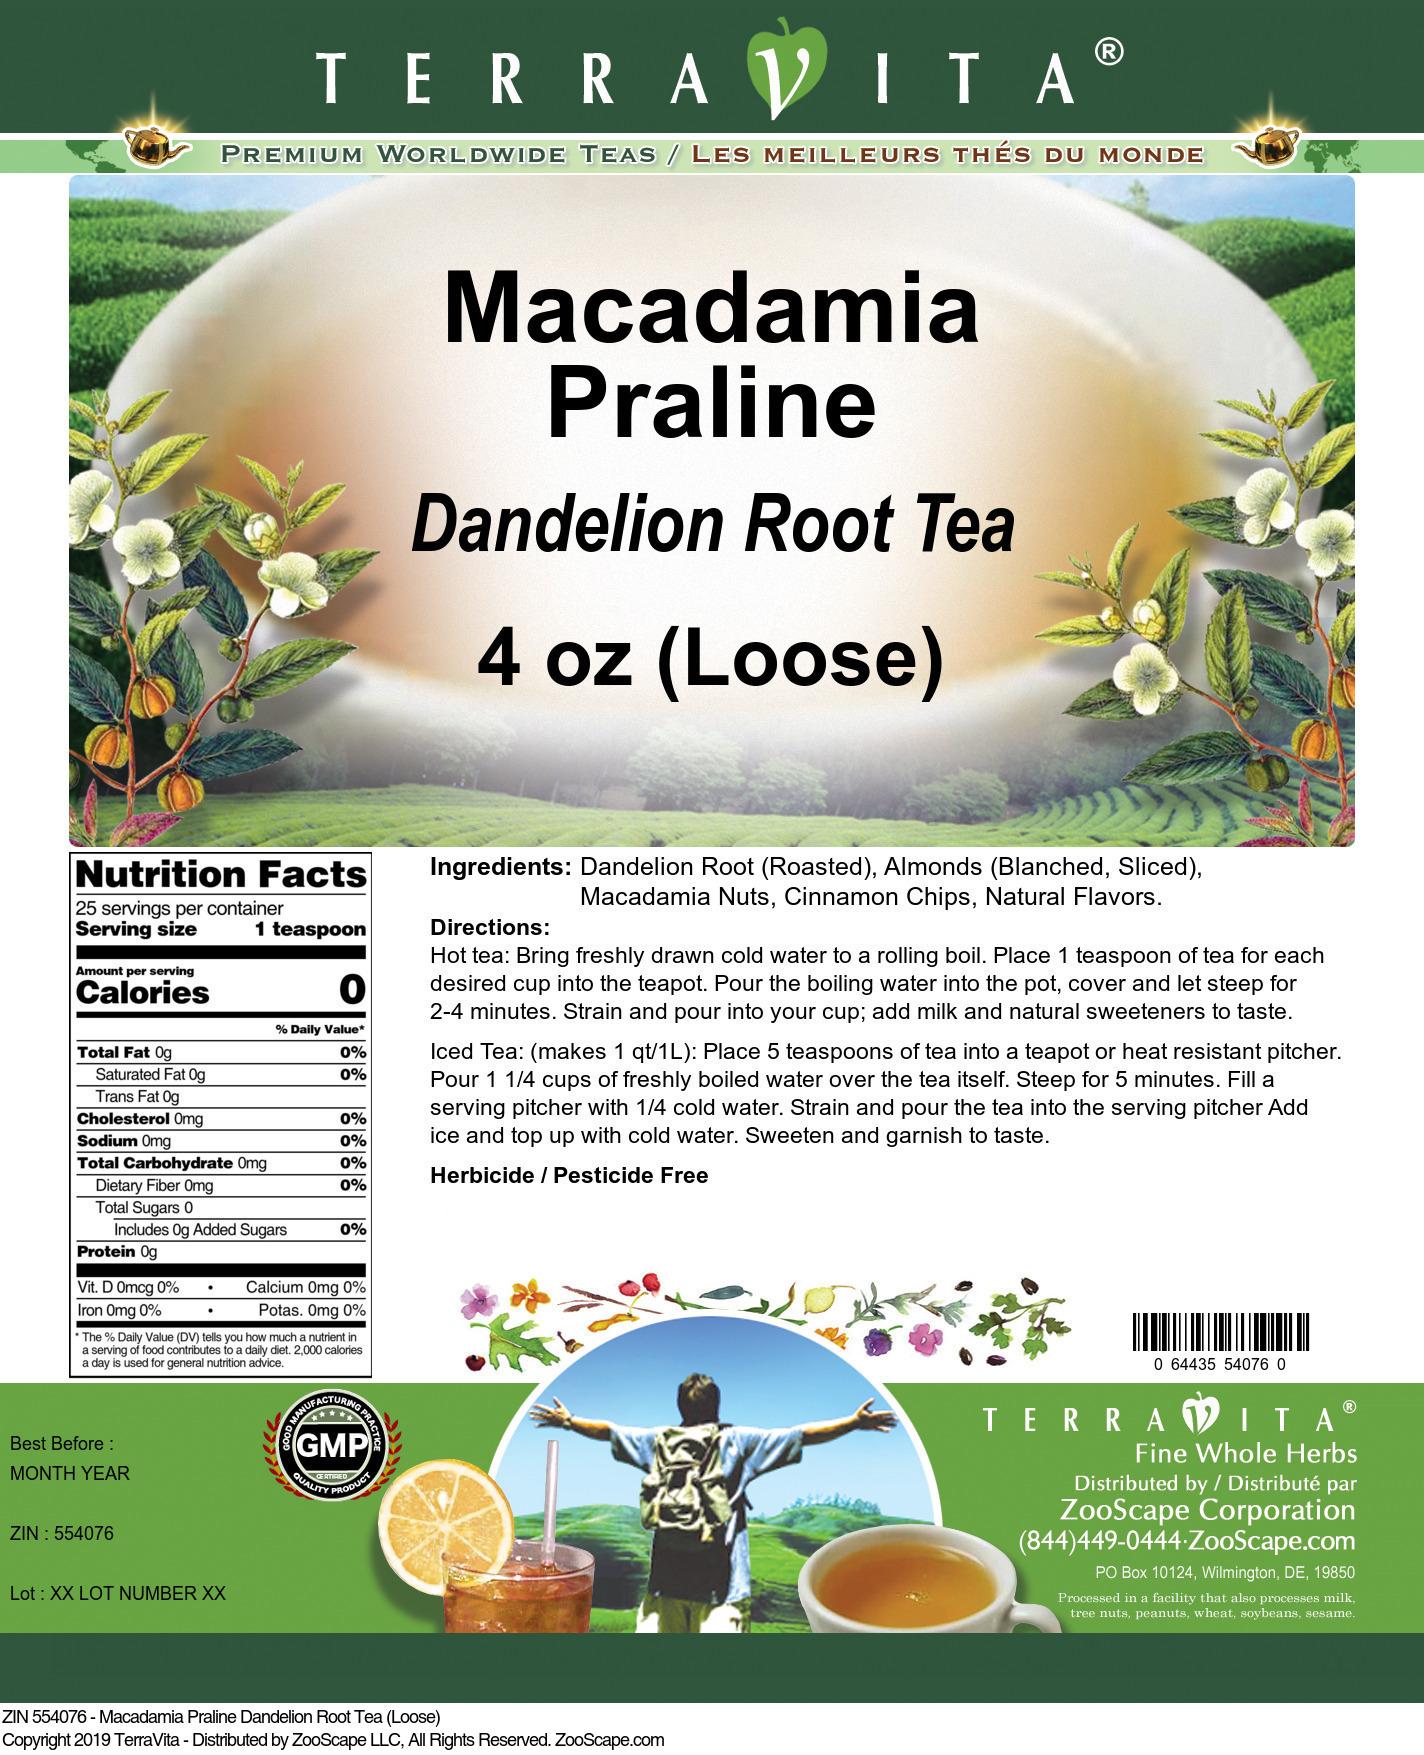 Macadamia Praline Dandelion Root Tea (Loose)